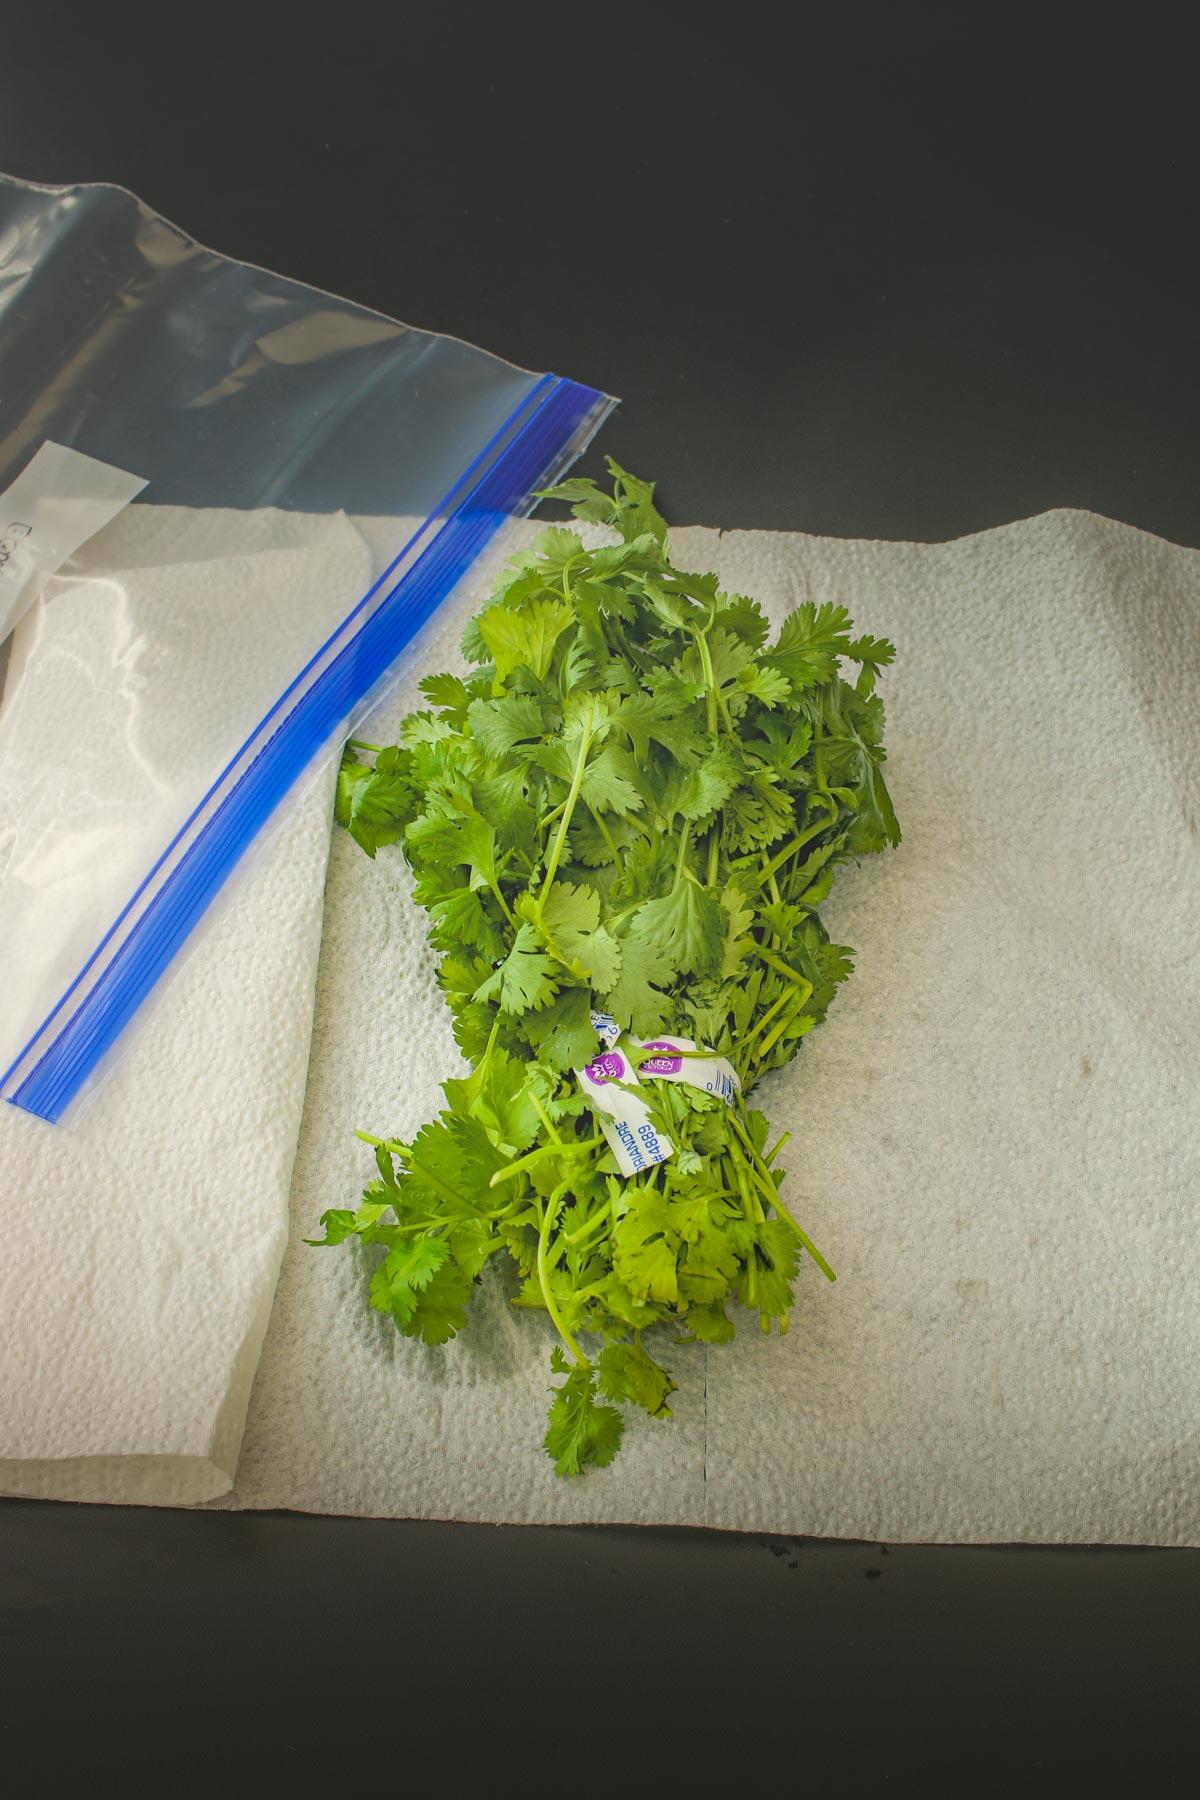 cilantro on paper toweling next to ziptop bag.